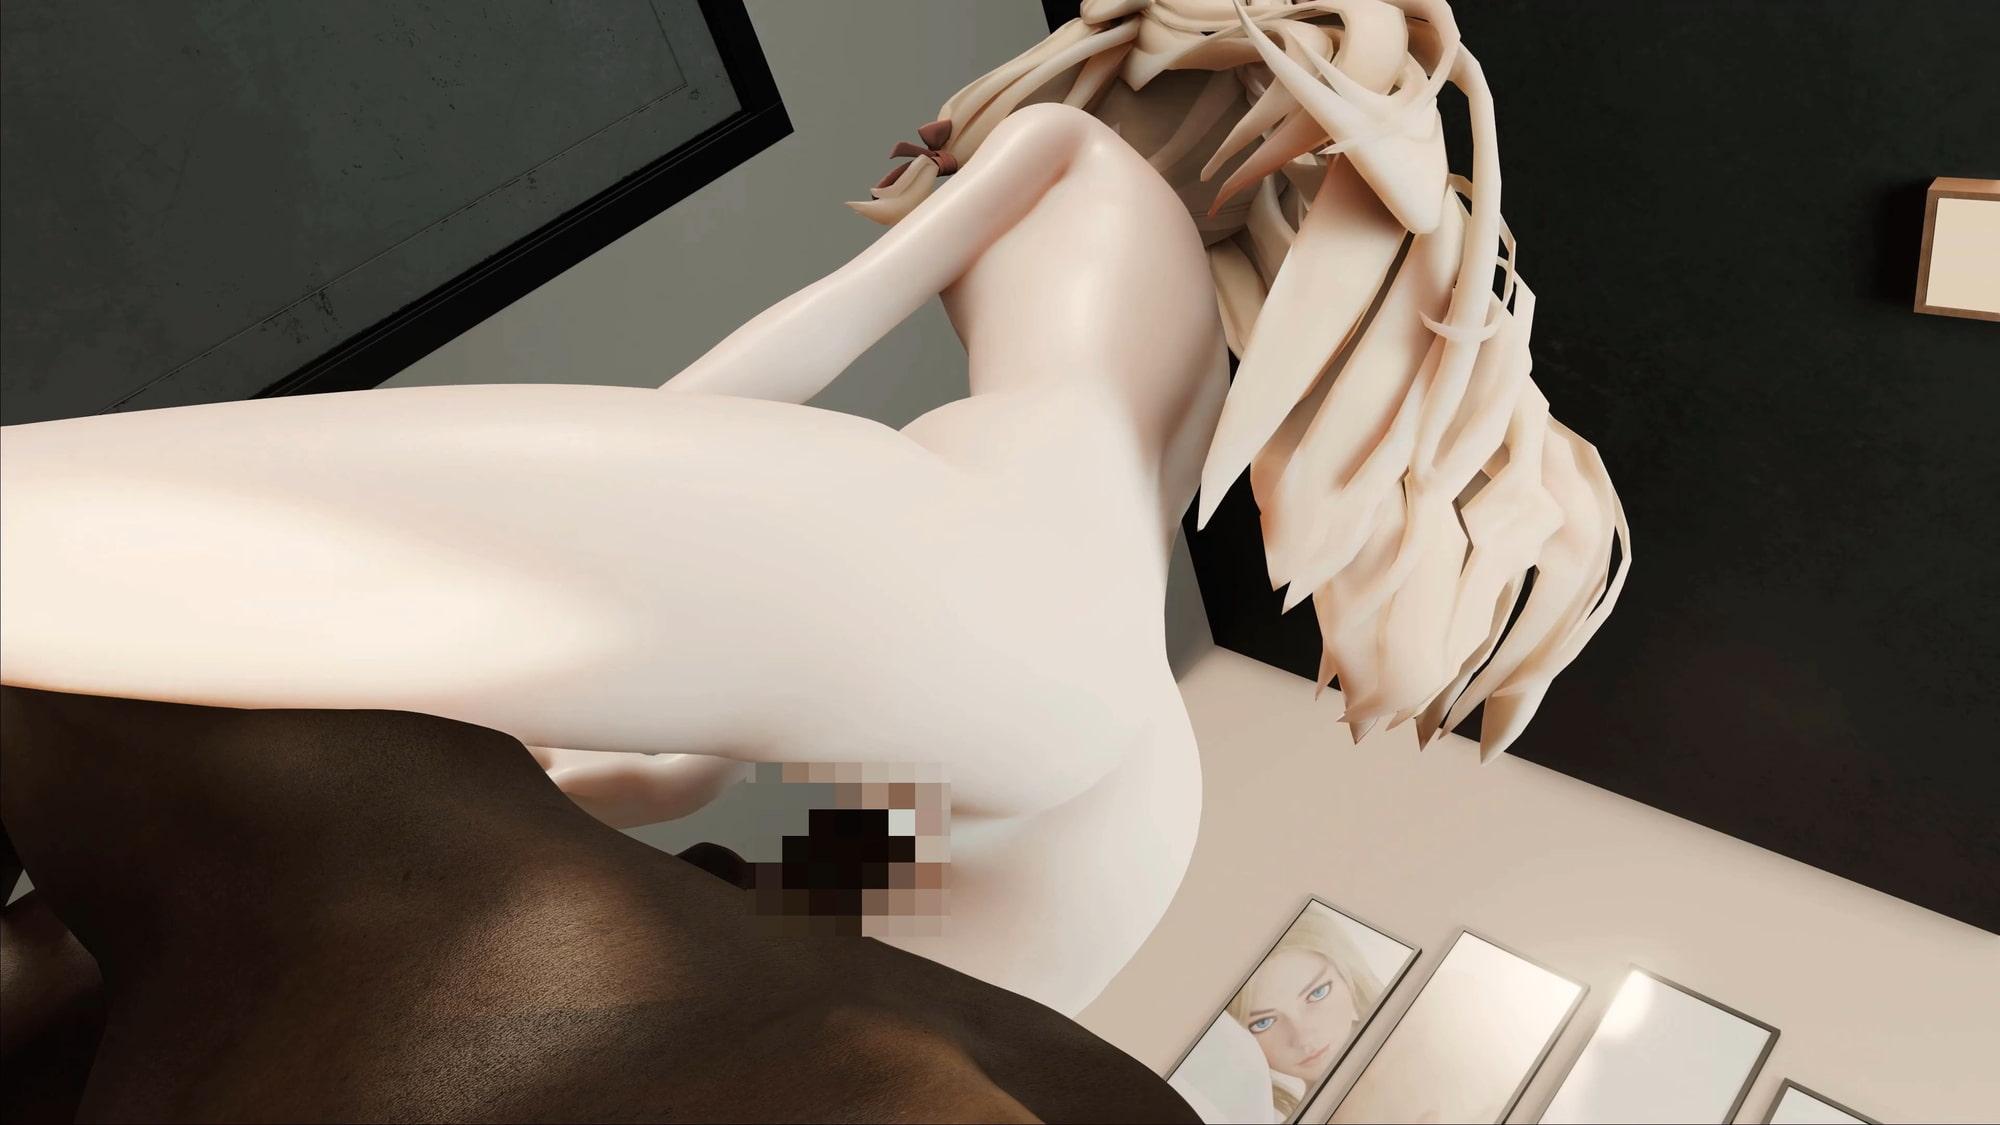 Loli Slut Chika JK for Big Dick | ビッグディックのためのロリ痴女チカJK